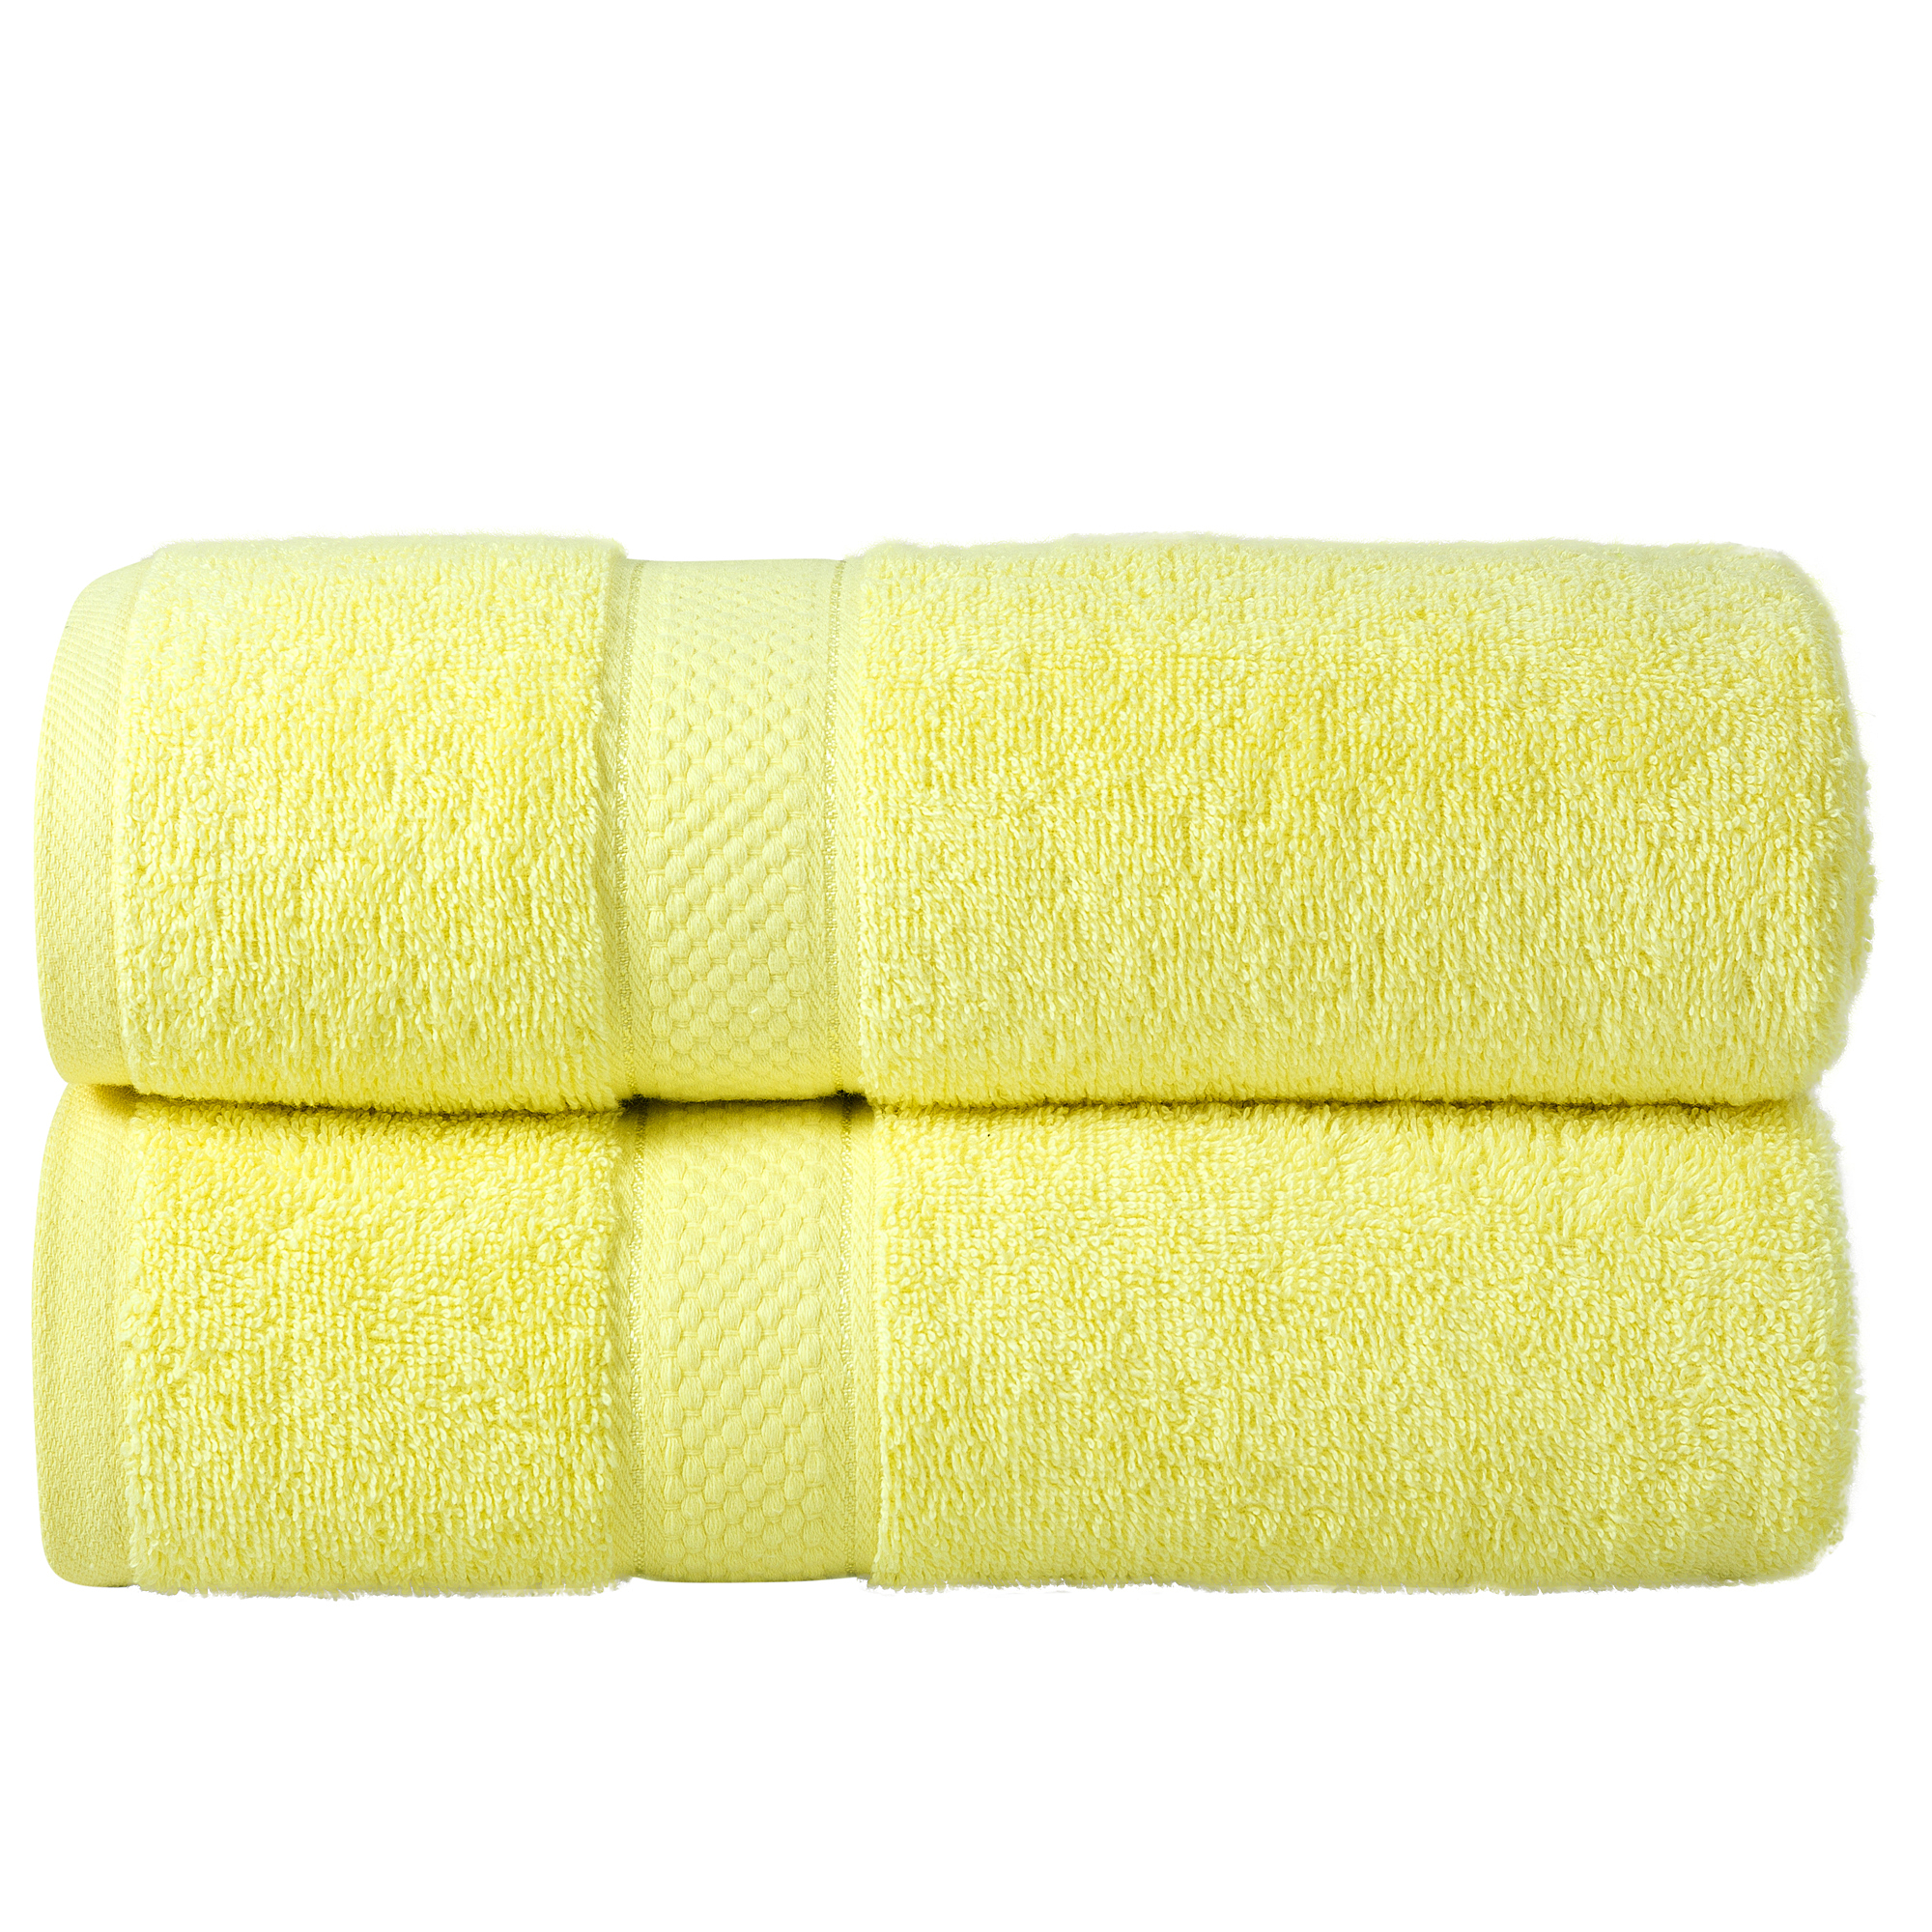 Bale Set 2pcs Lemon Plain Bath Towel